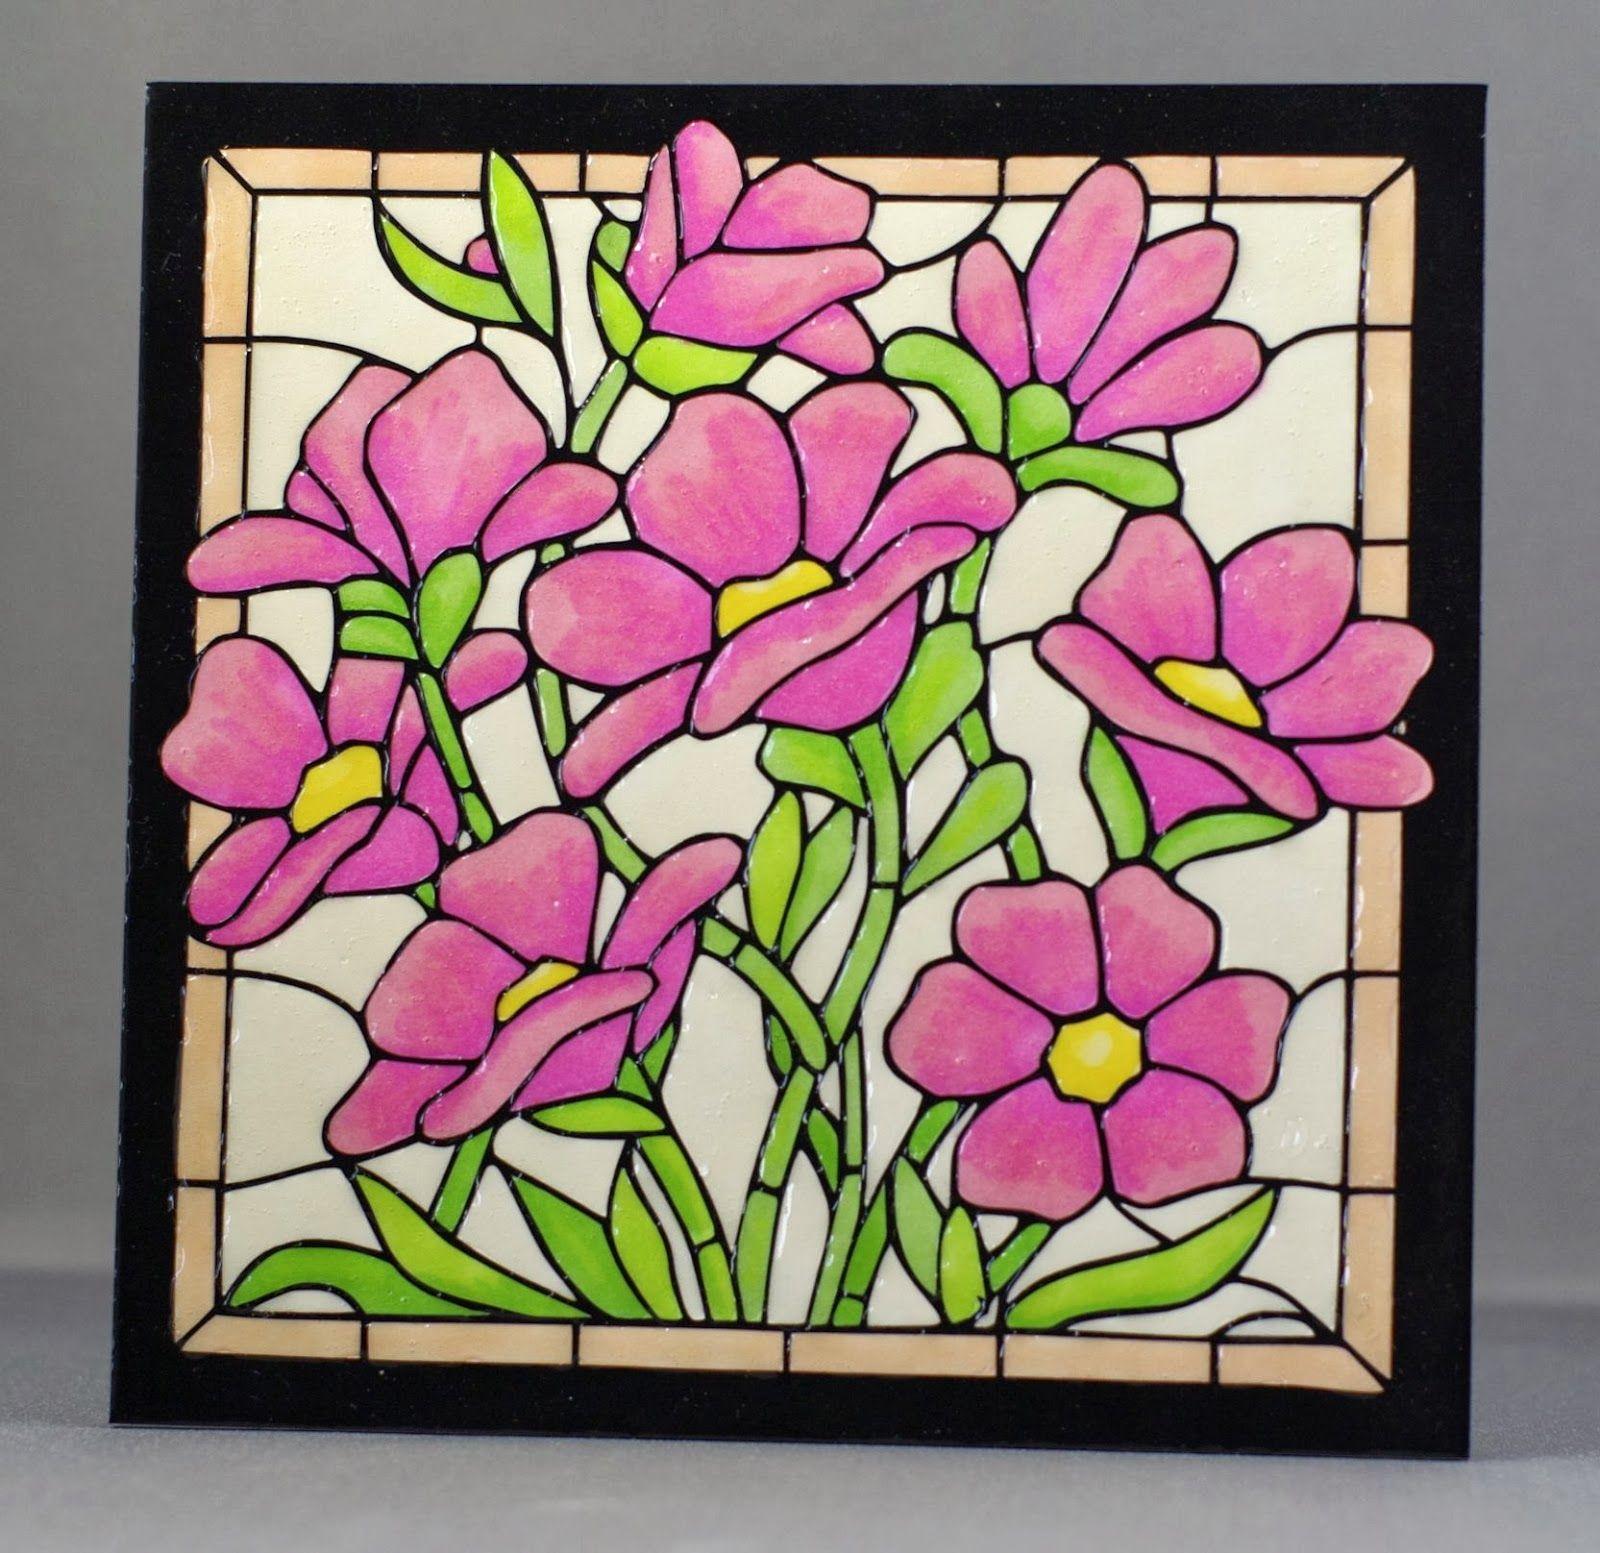 Glass Painting Outline Glass Painting Outline Designs Of Flowers